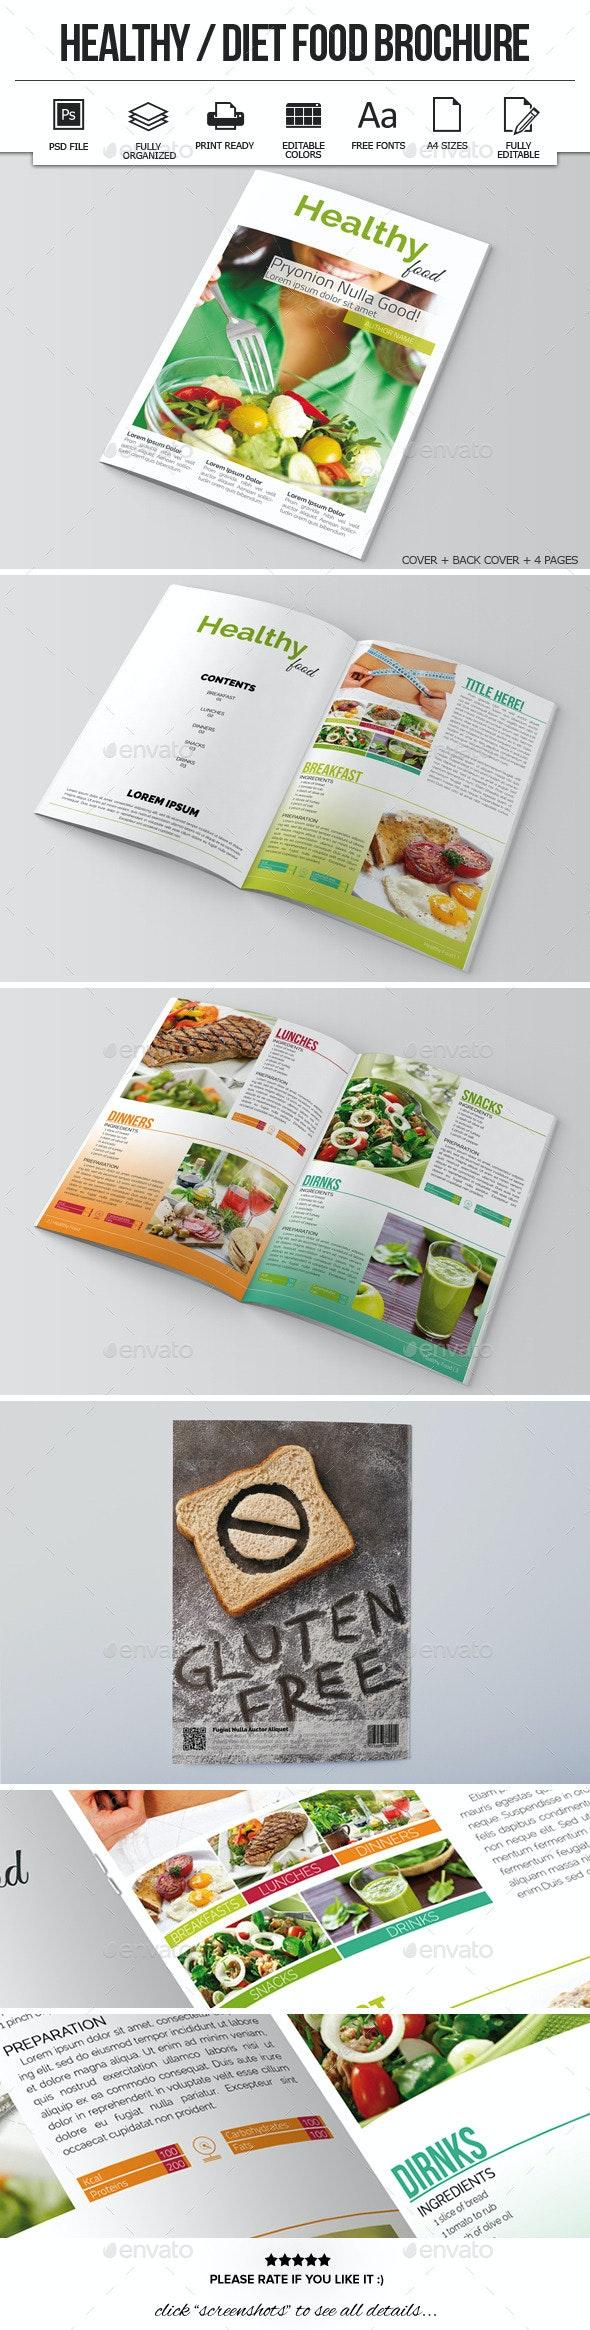 Healthy / Diet Food Brochure Template - Informational Brochures